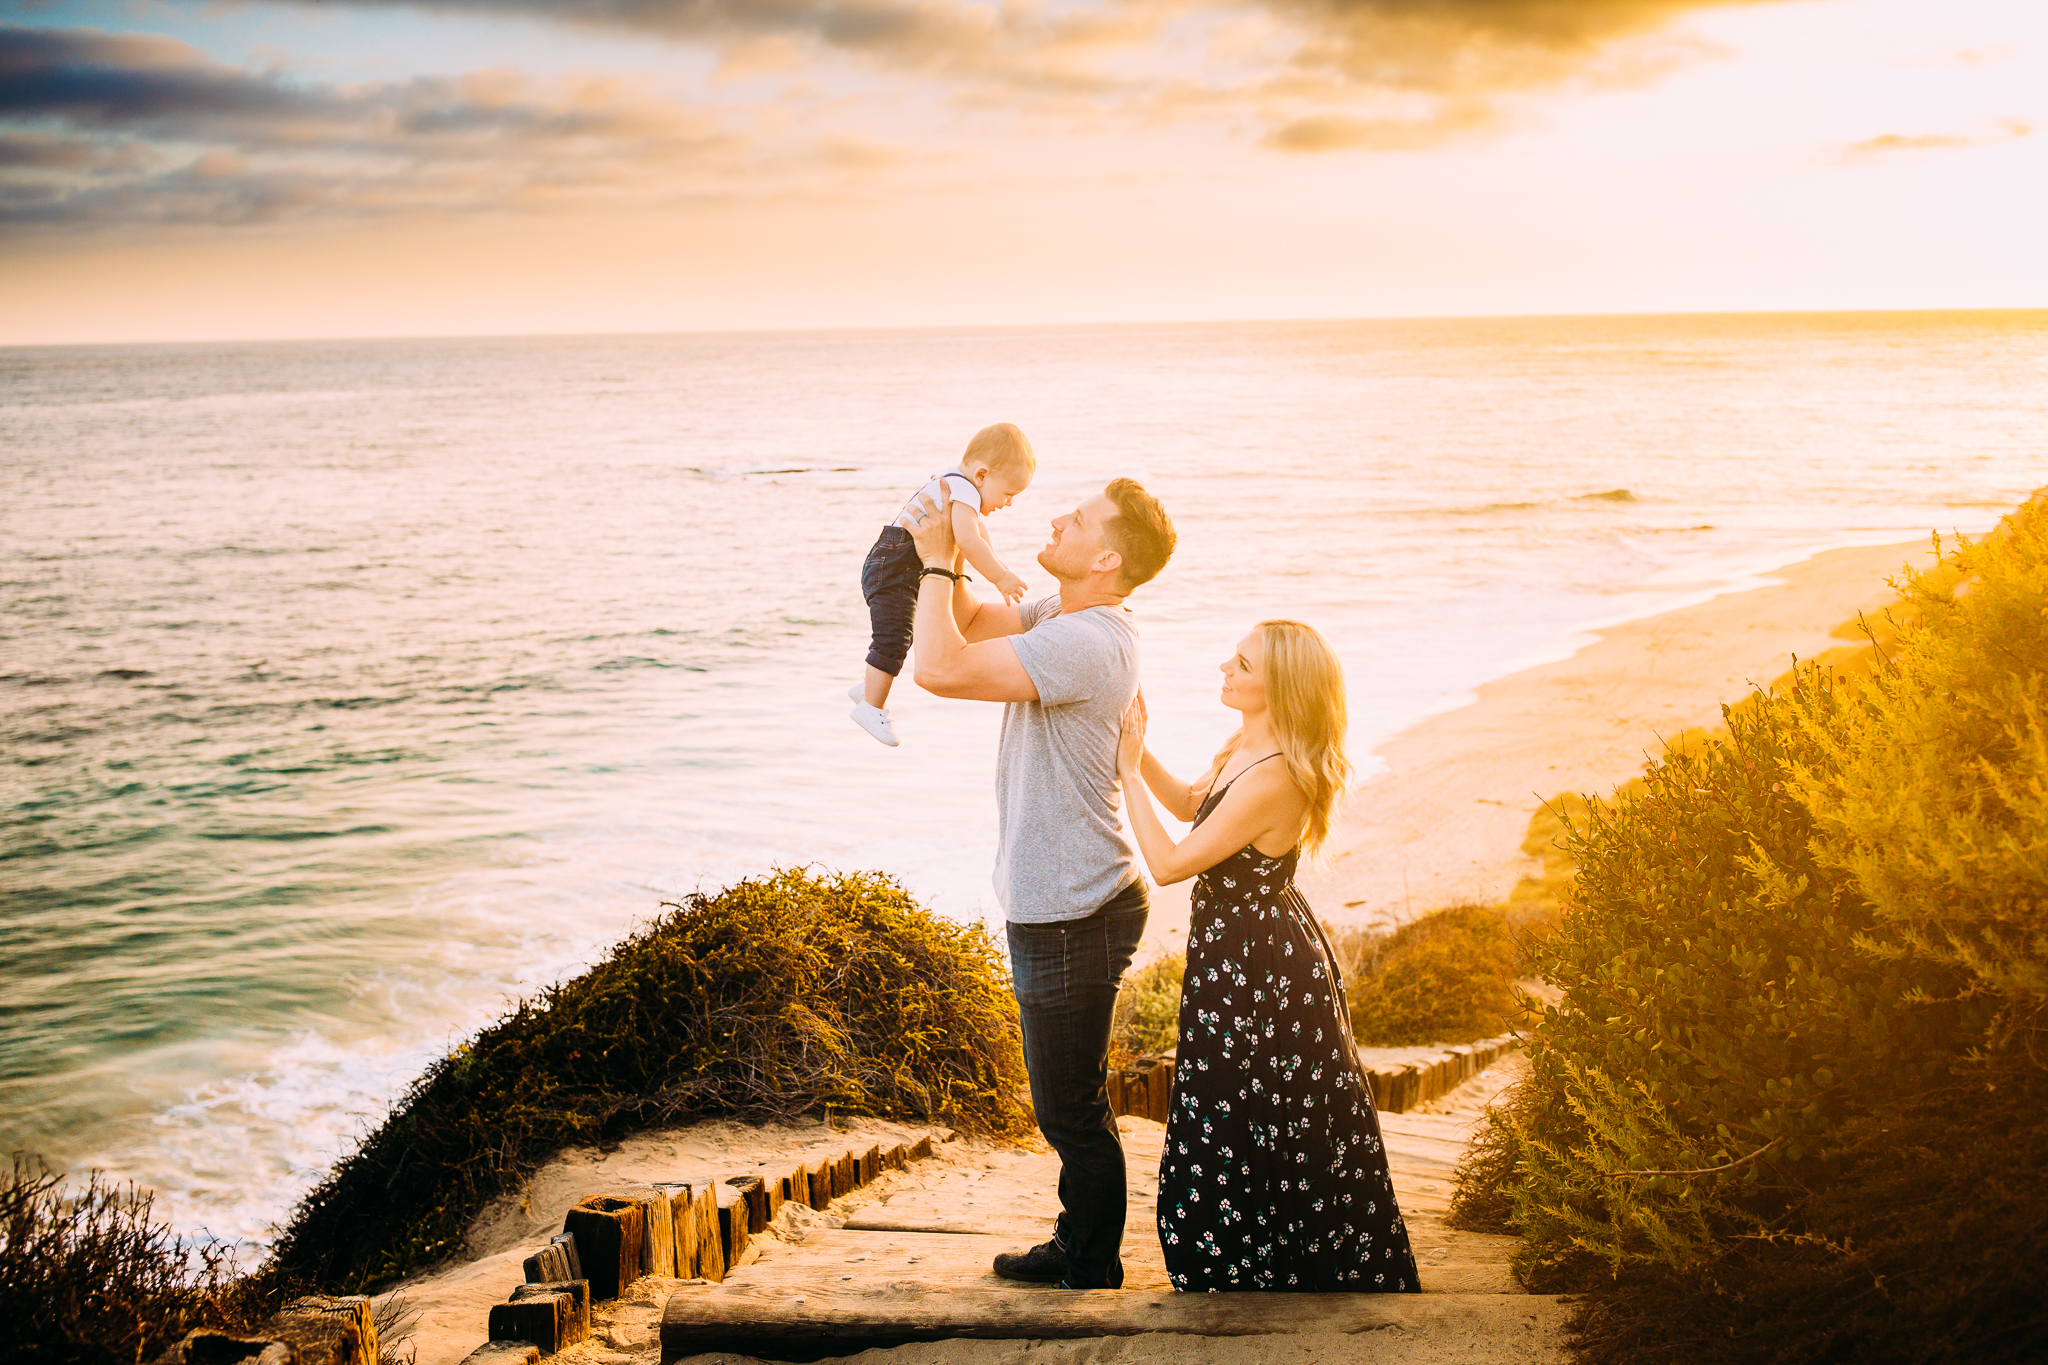 newportbeachfamilyphotographer-15.jpg